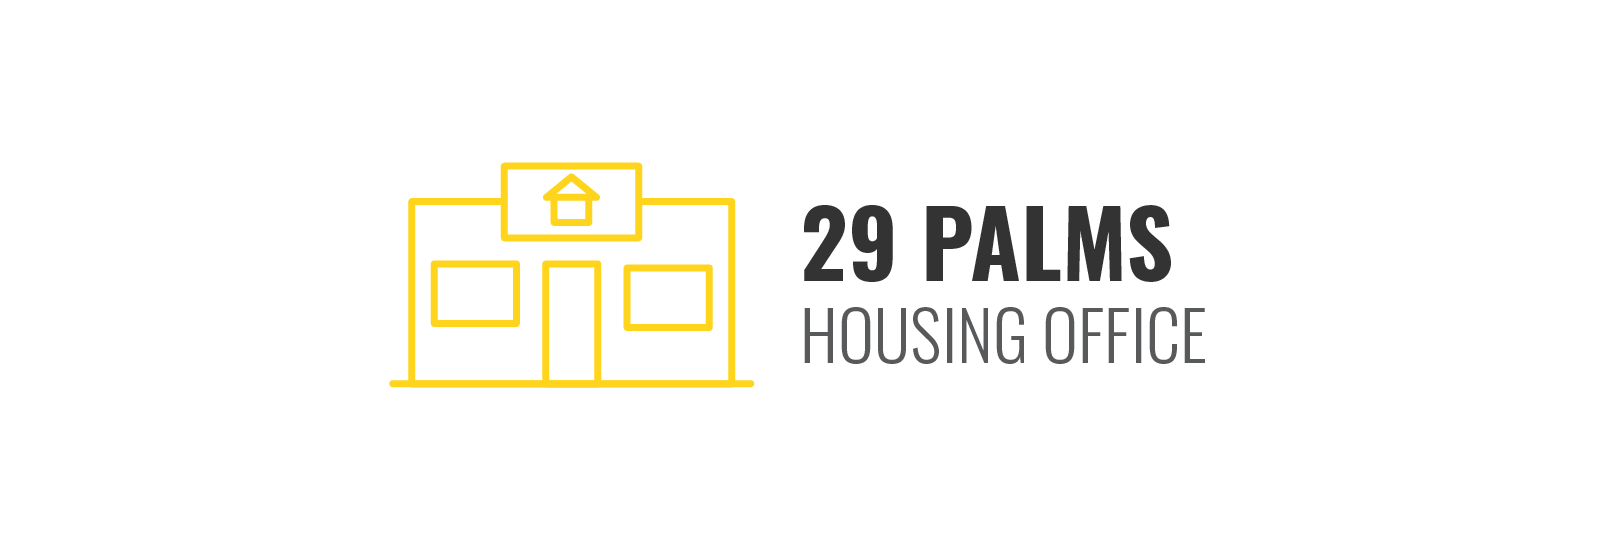 29 Palms Housing Office